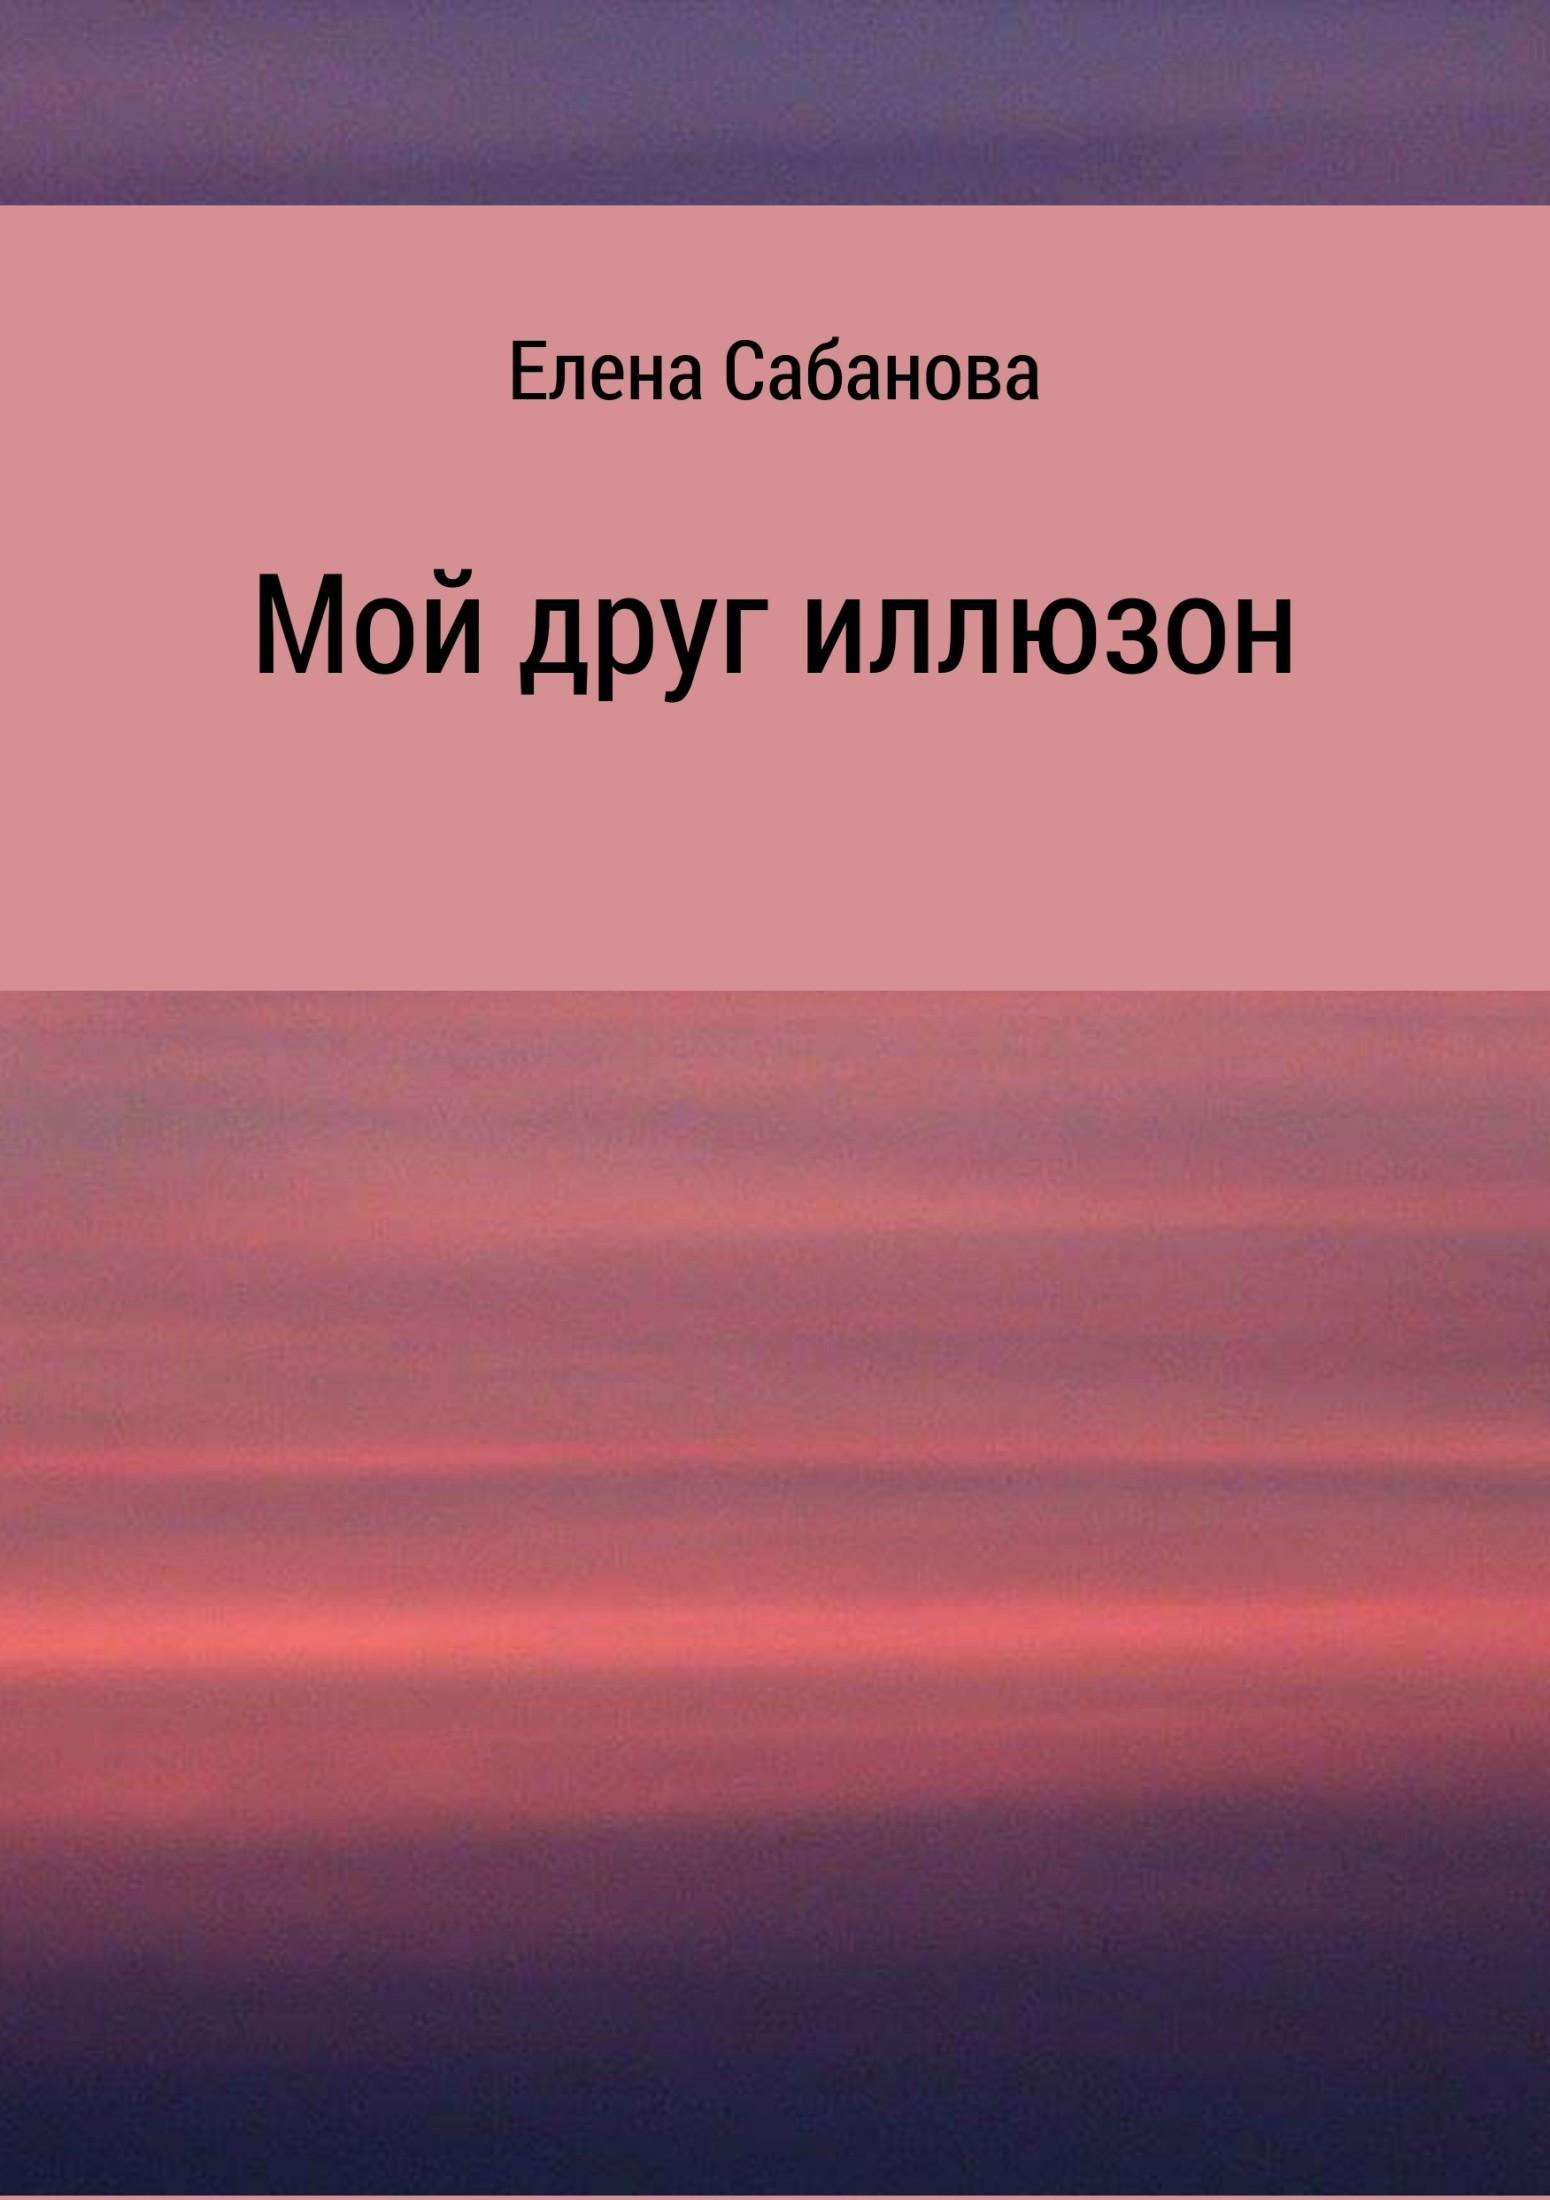 Елена Владимировна Сабанова бесплатно